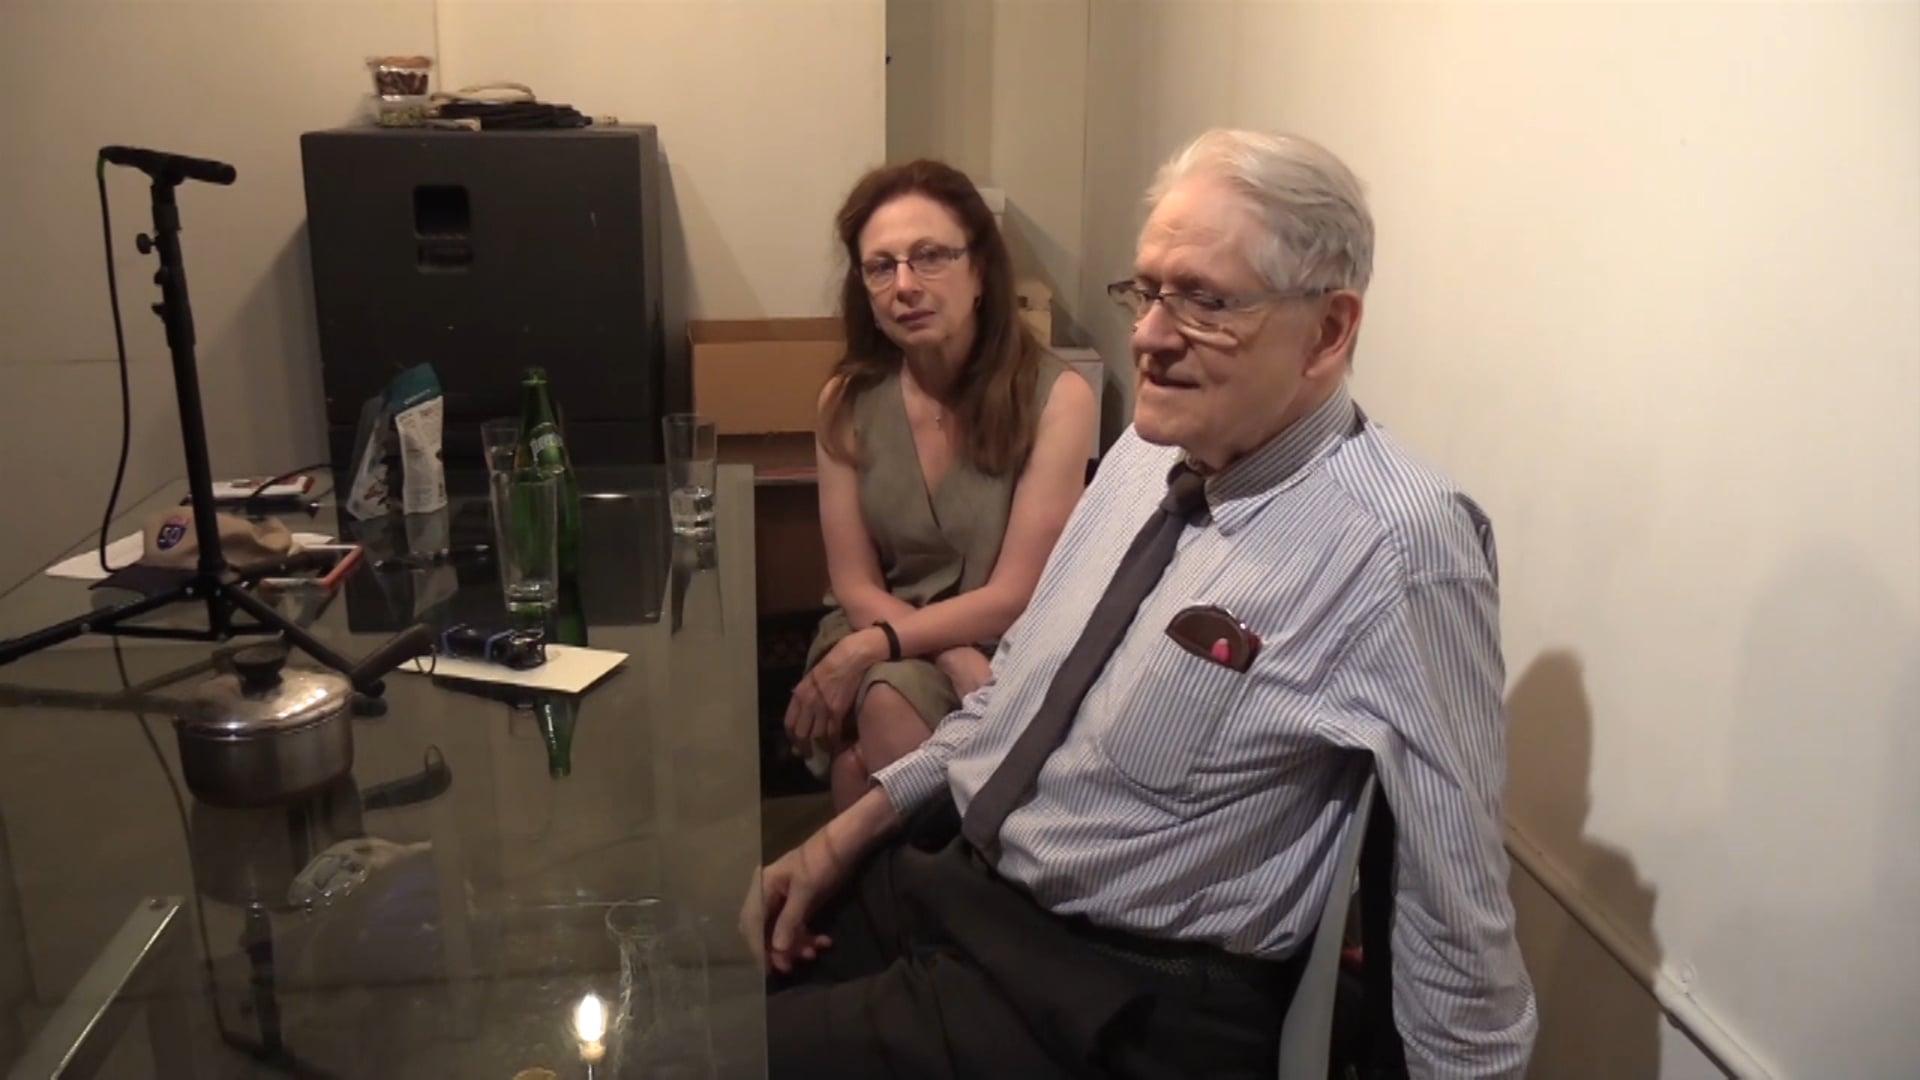 Interview with Gordon Mumma